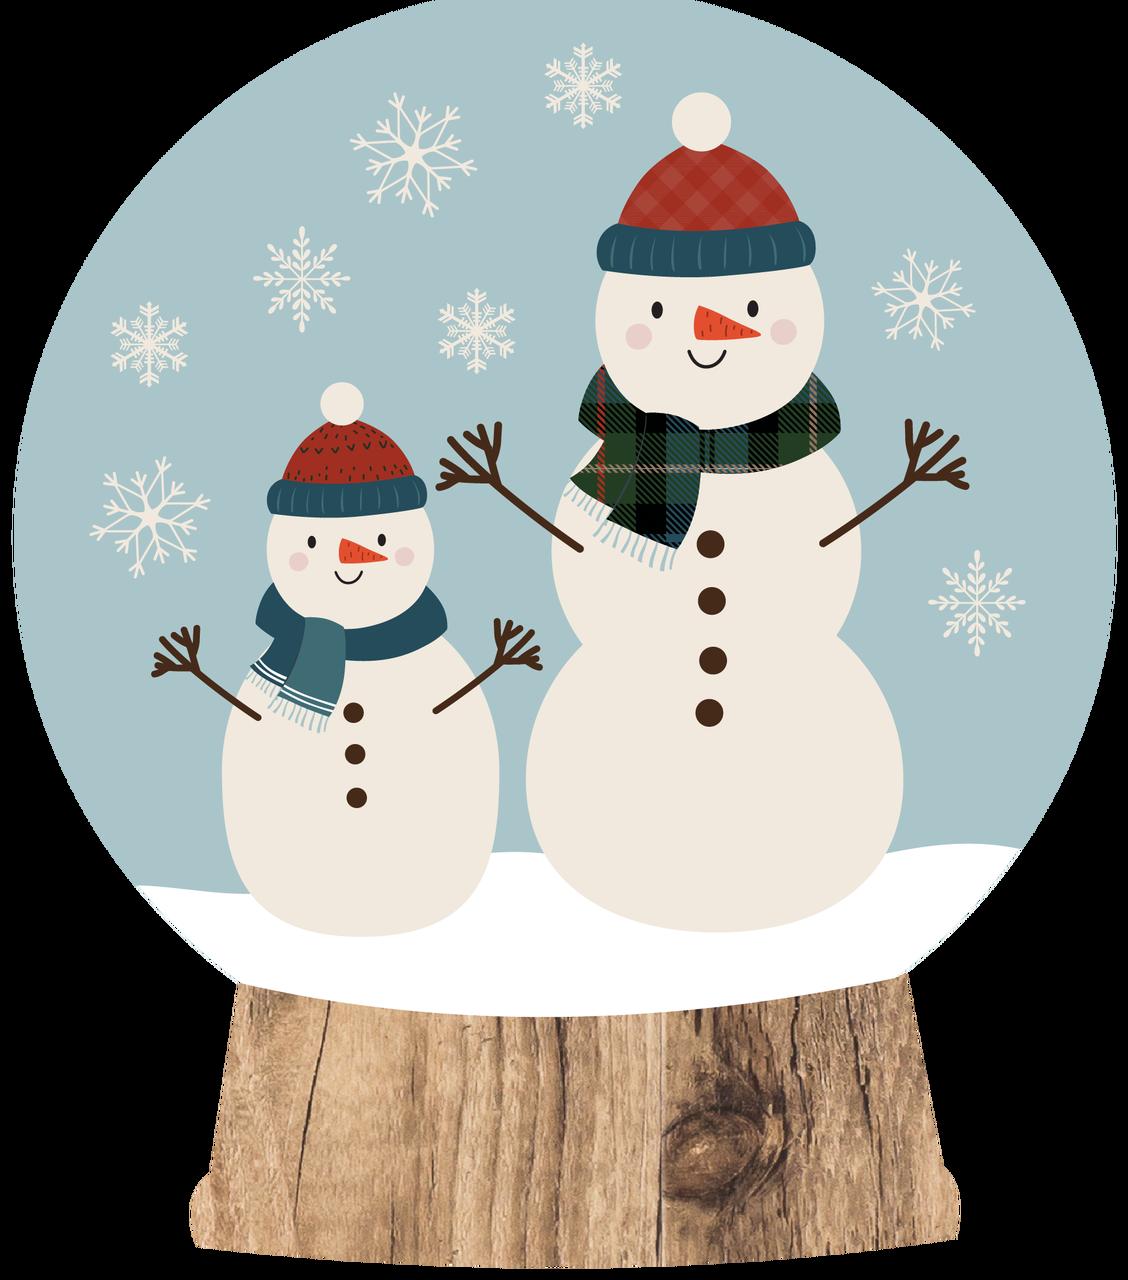 Snow Globe Print & Cut File